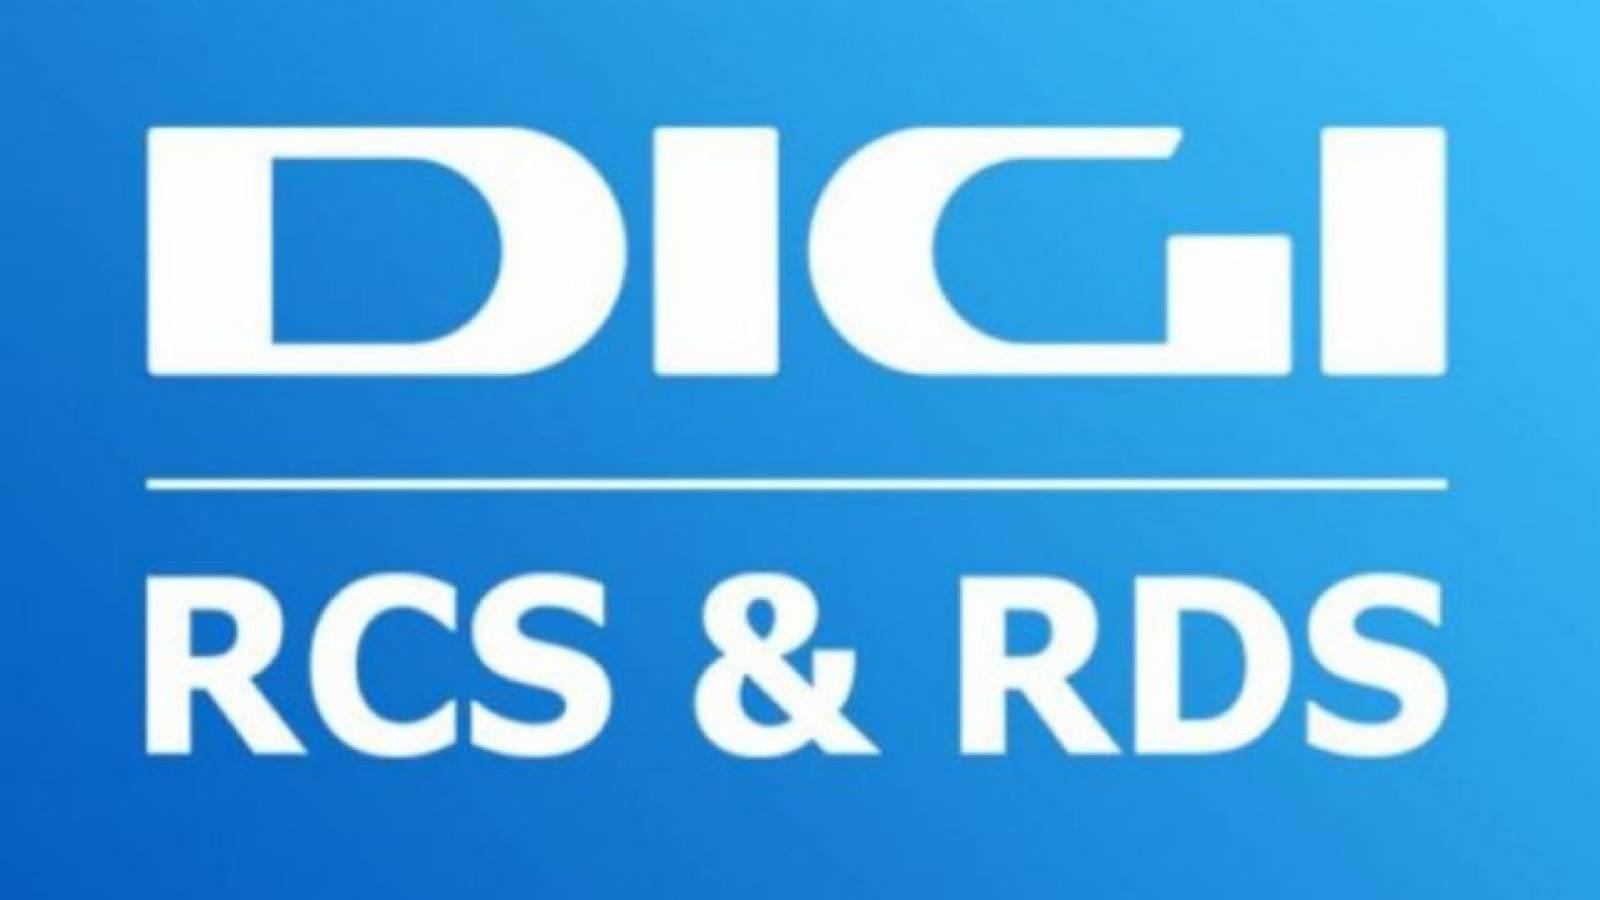 RCS & RDS selfie